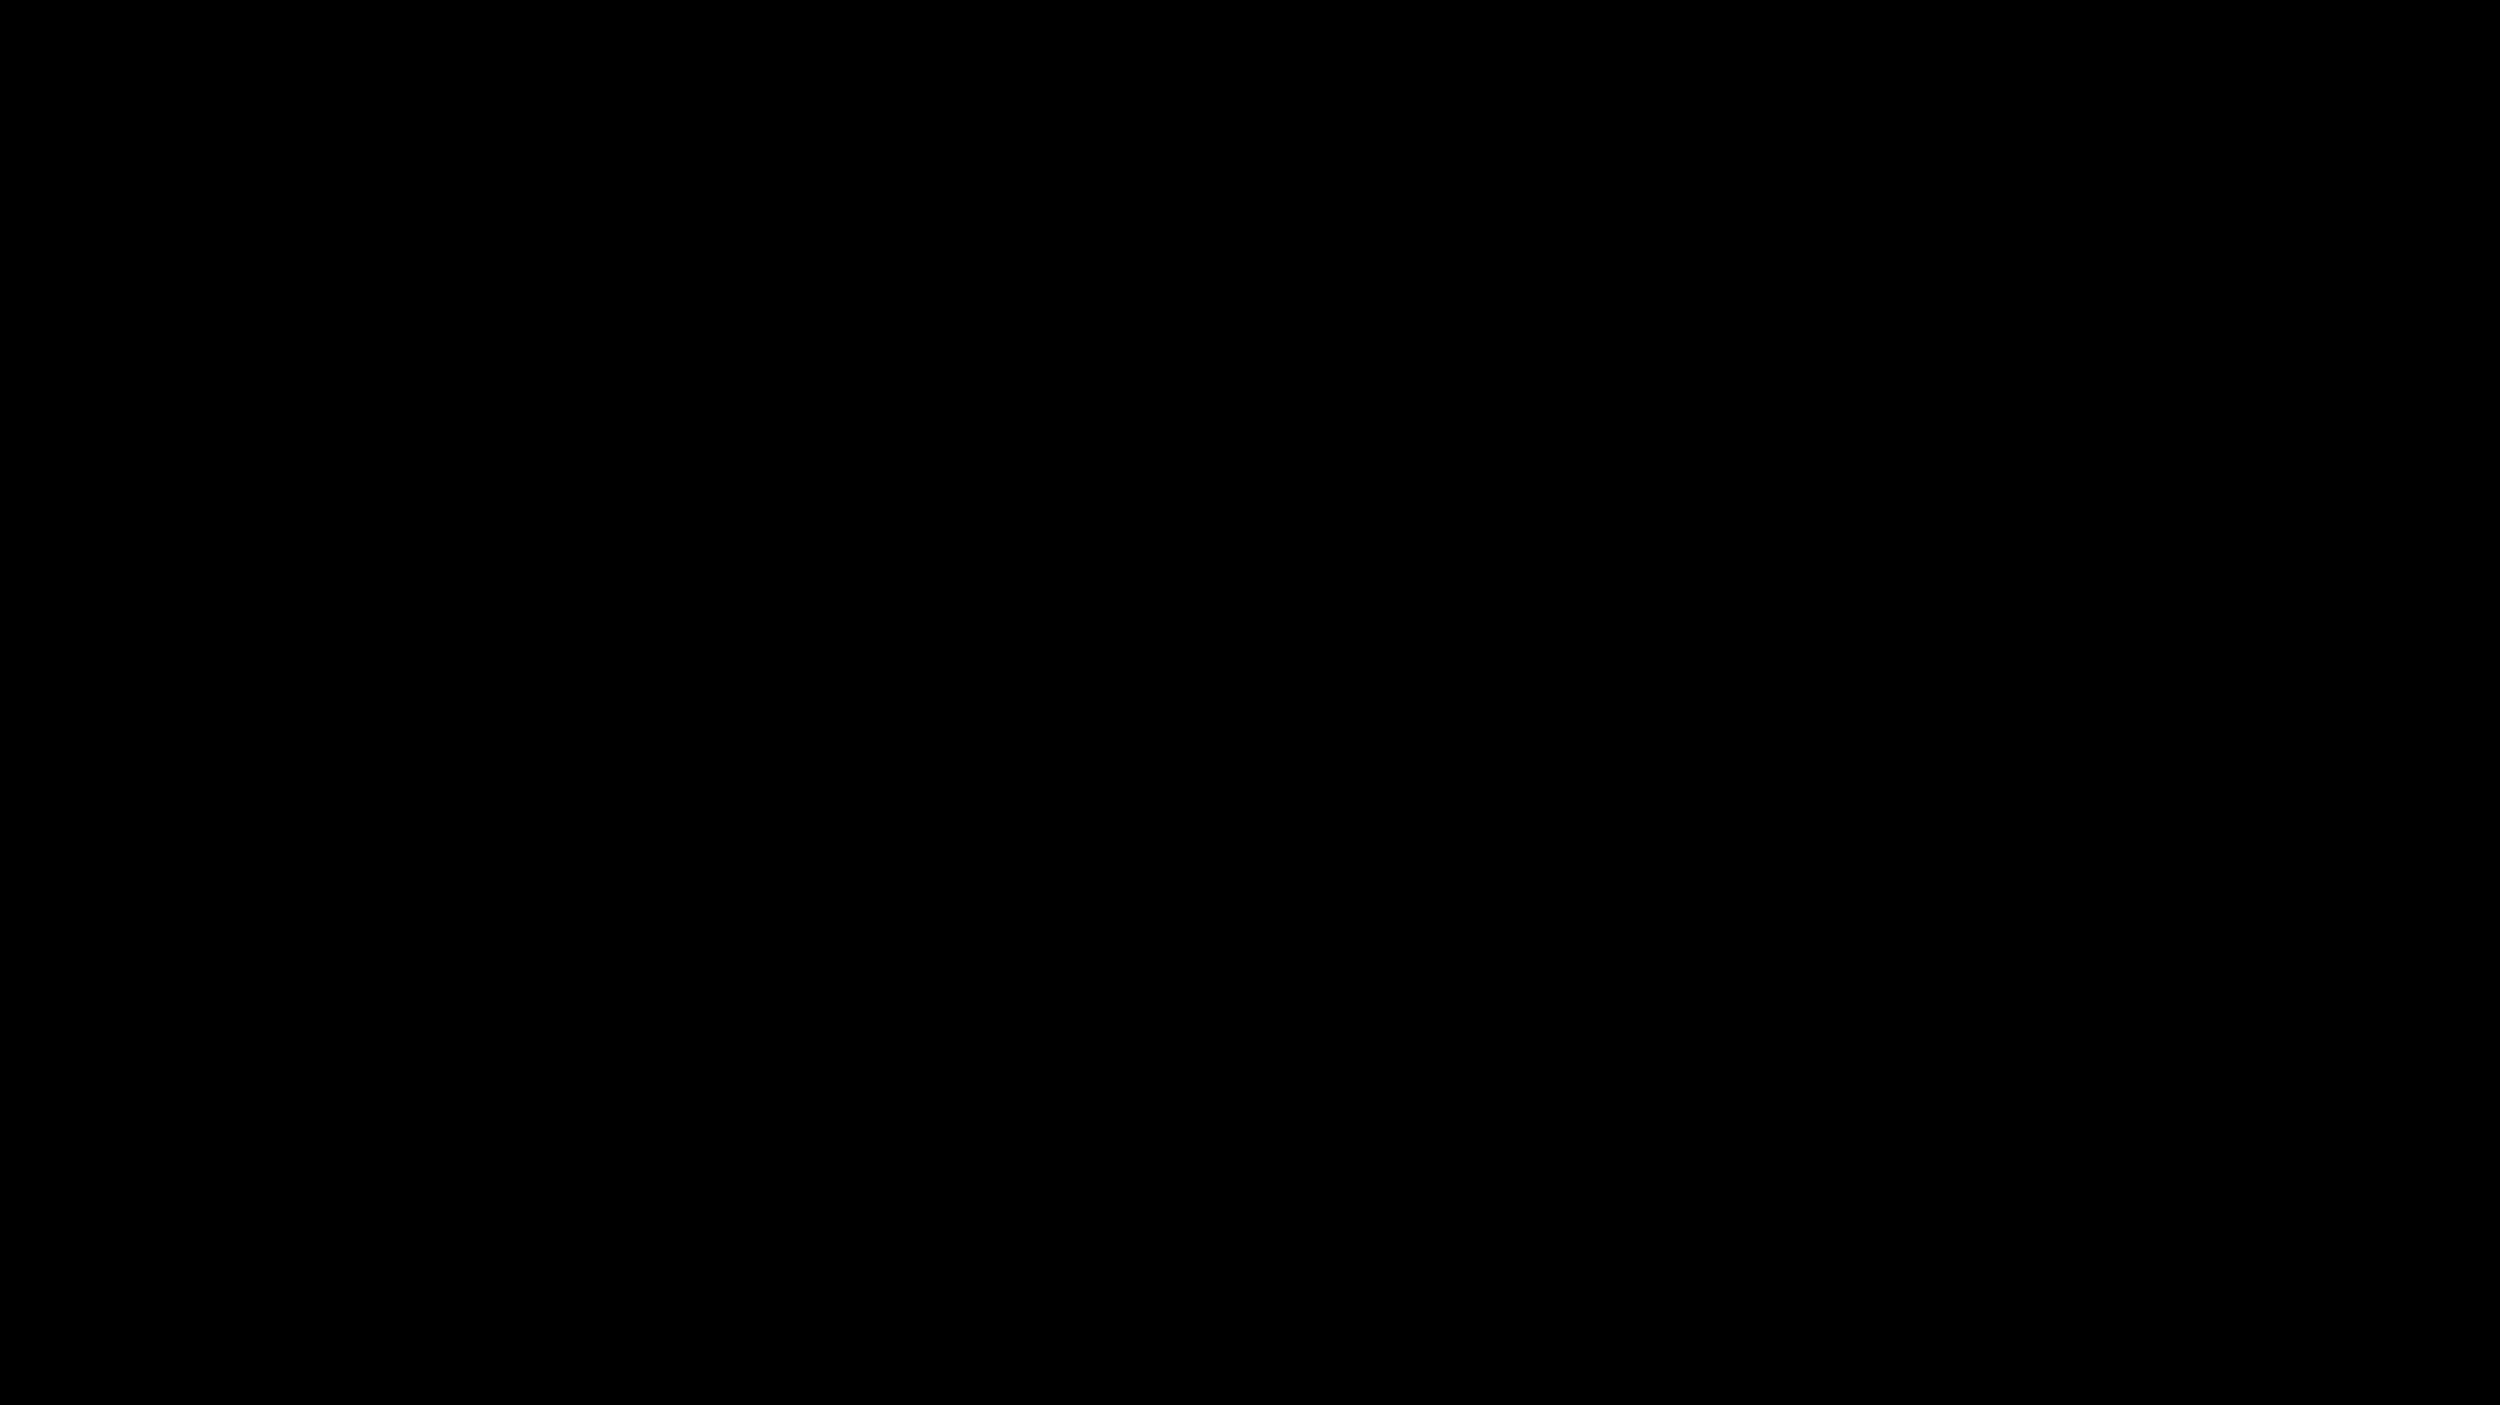 Tiffany_Lee_Logo-01.png